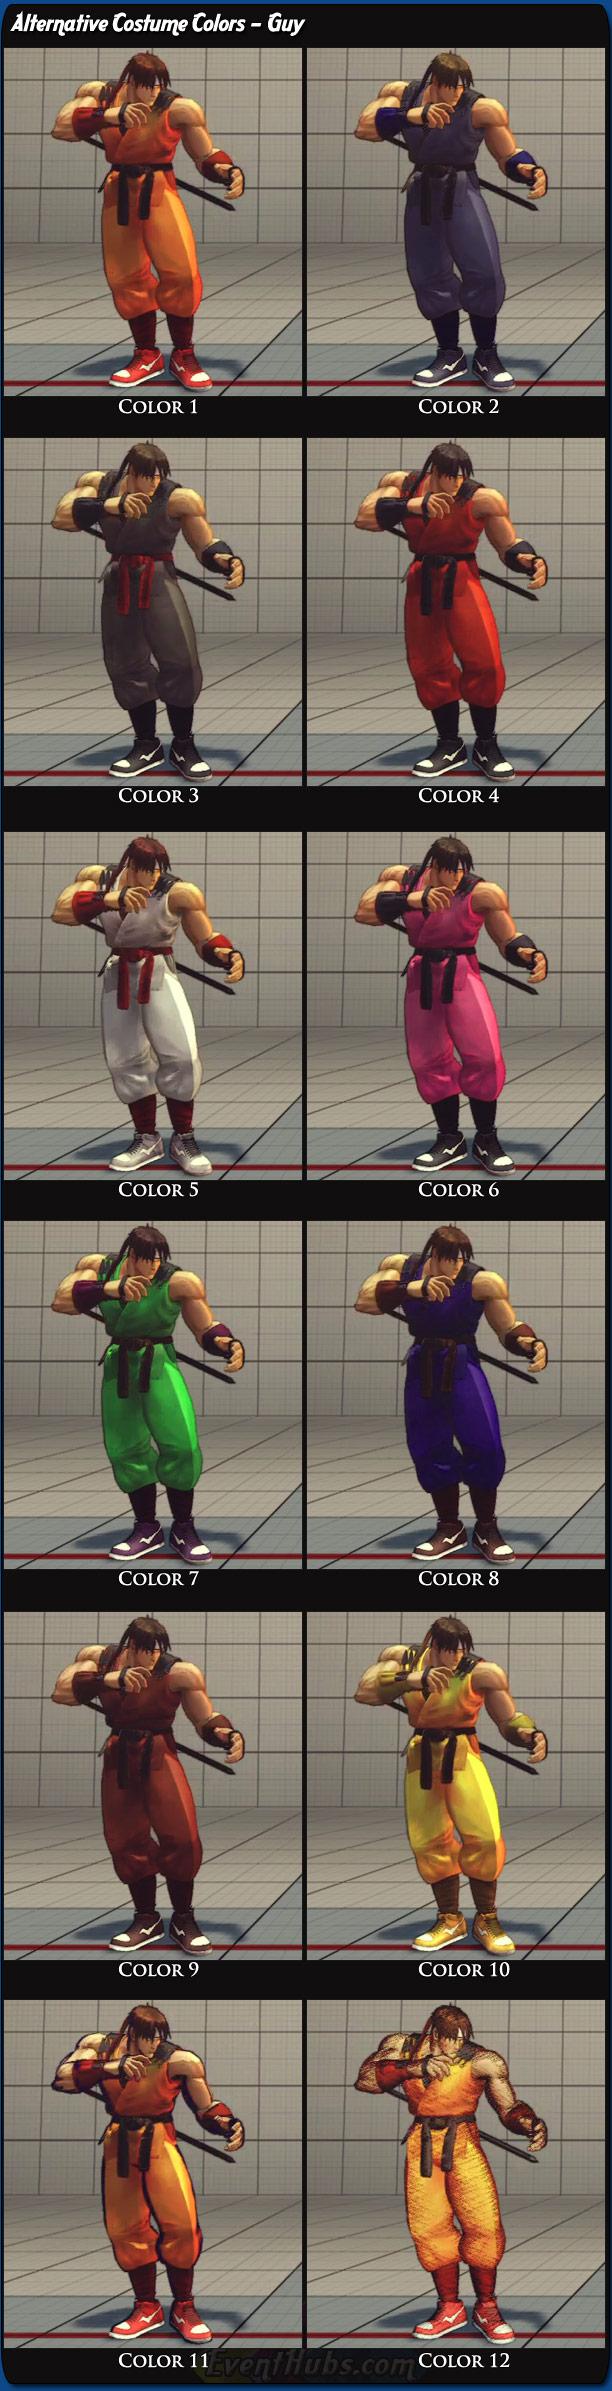 Guy's alternative costume colors for Super Street Fighter 4